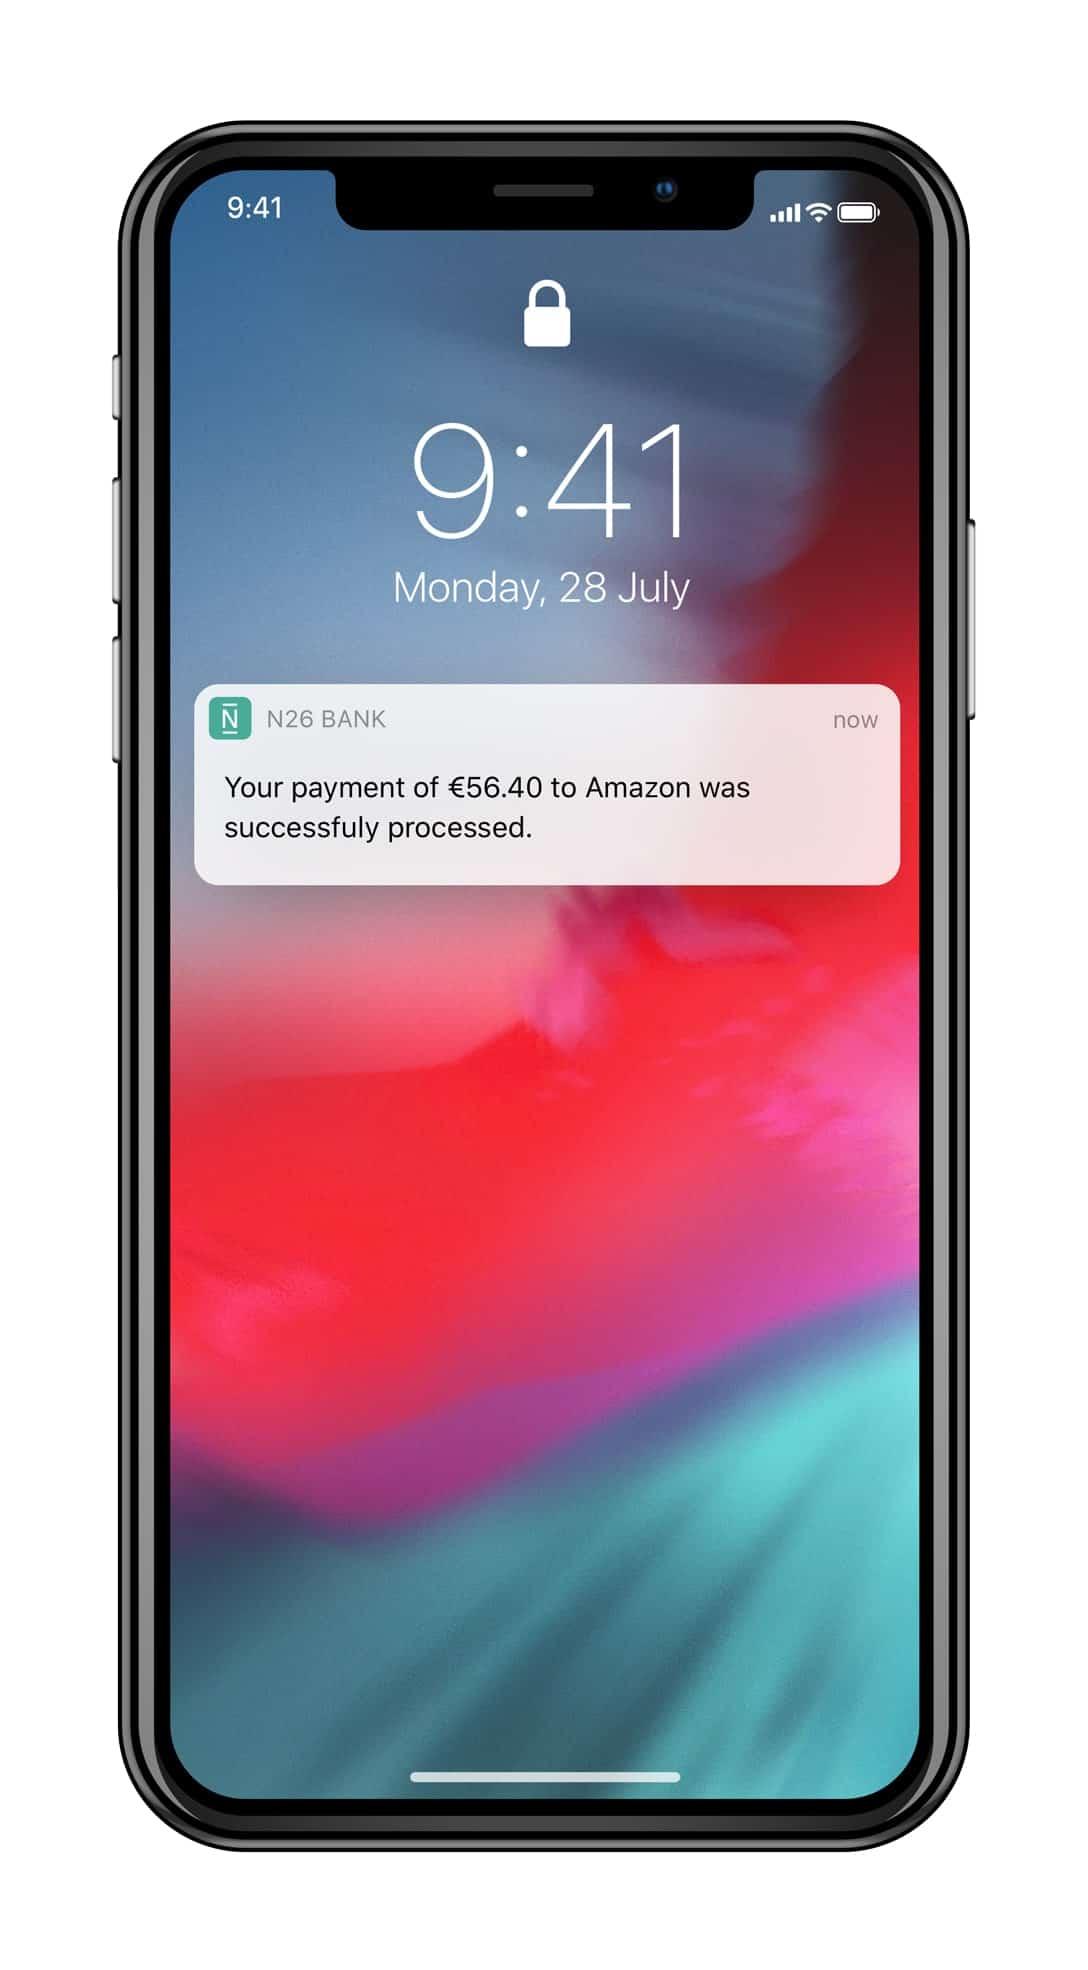 n26-card-push-notification-min